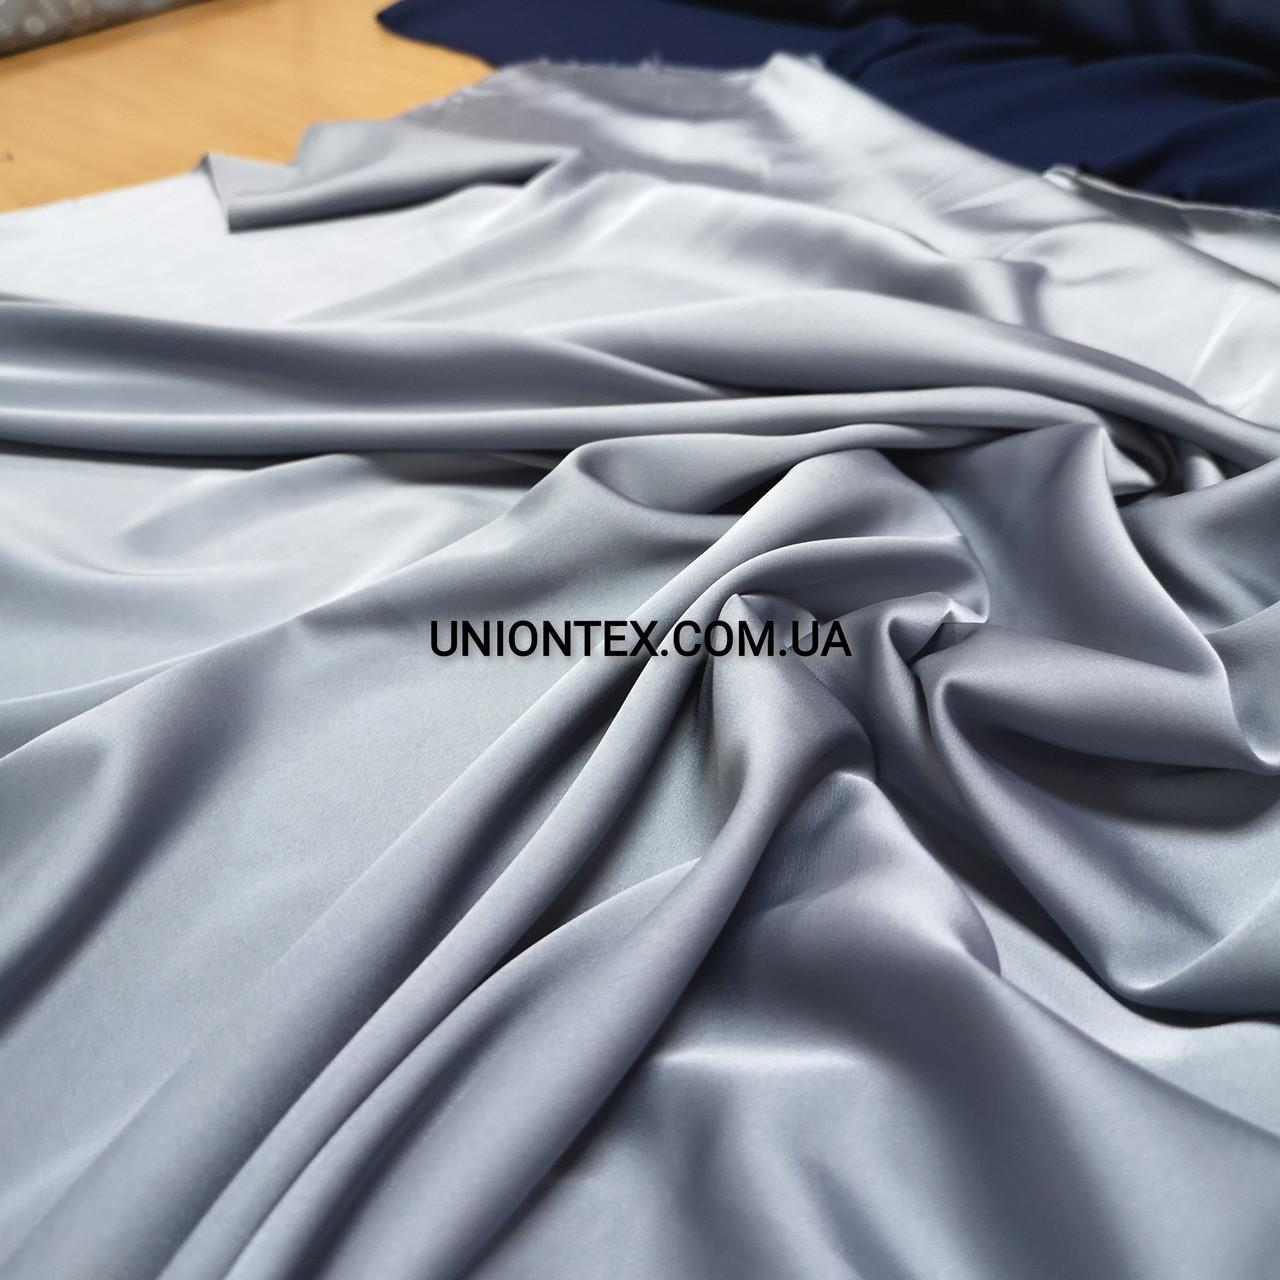 Ткань шелк-армани светло-серый